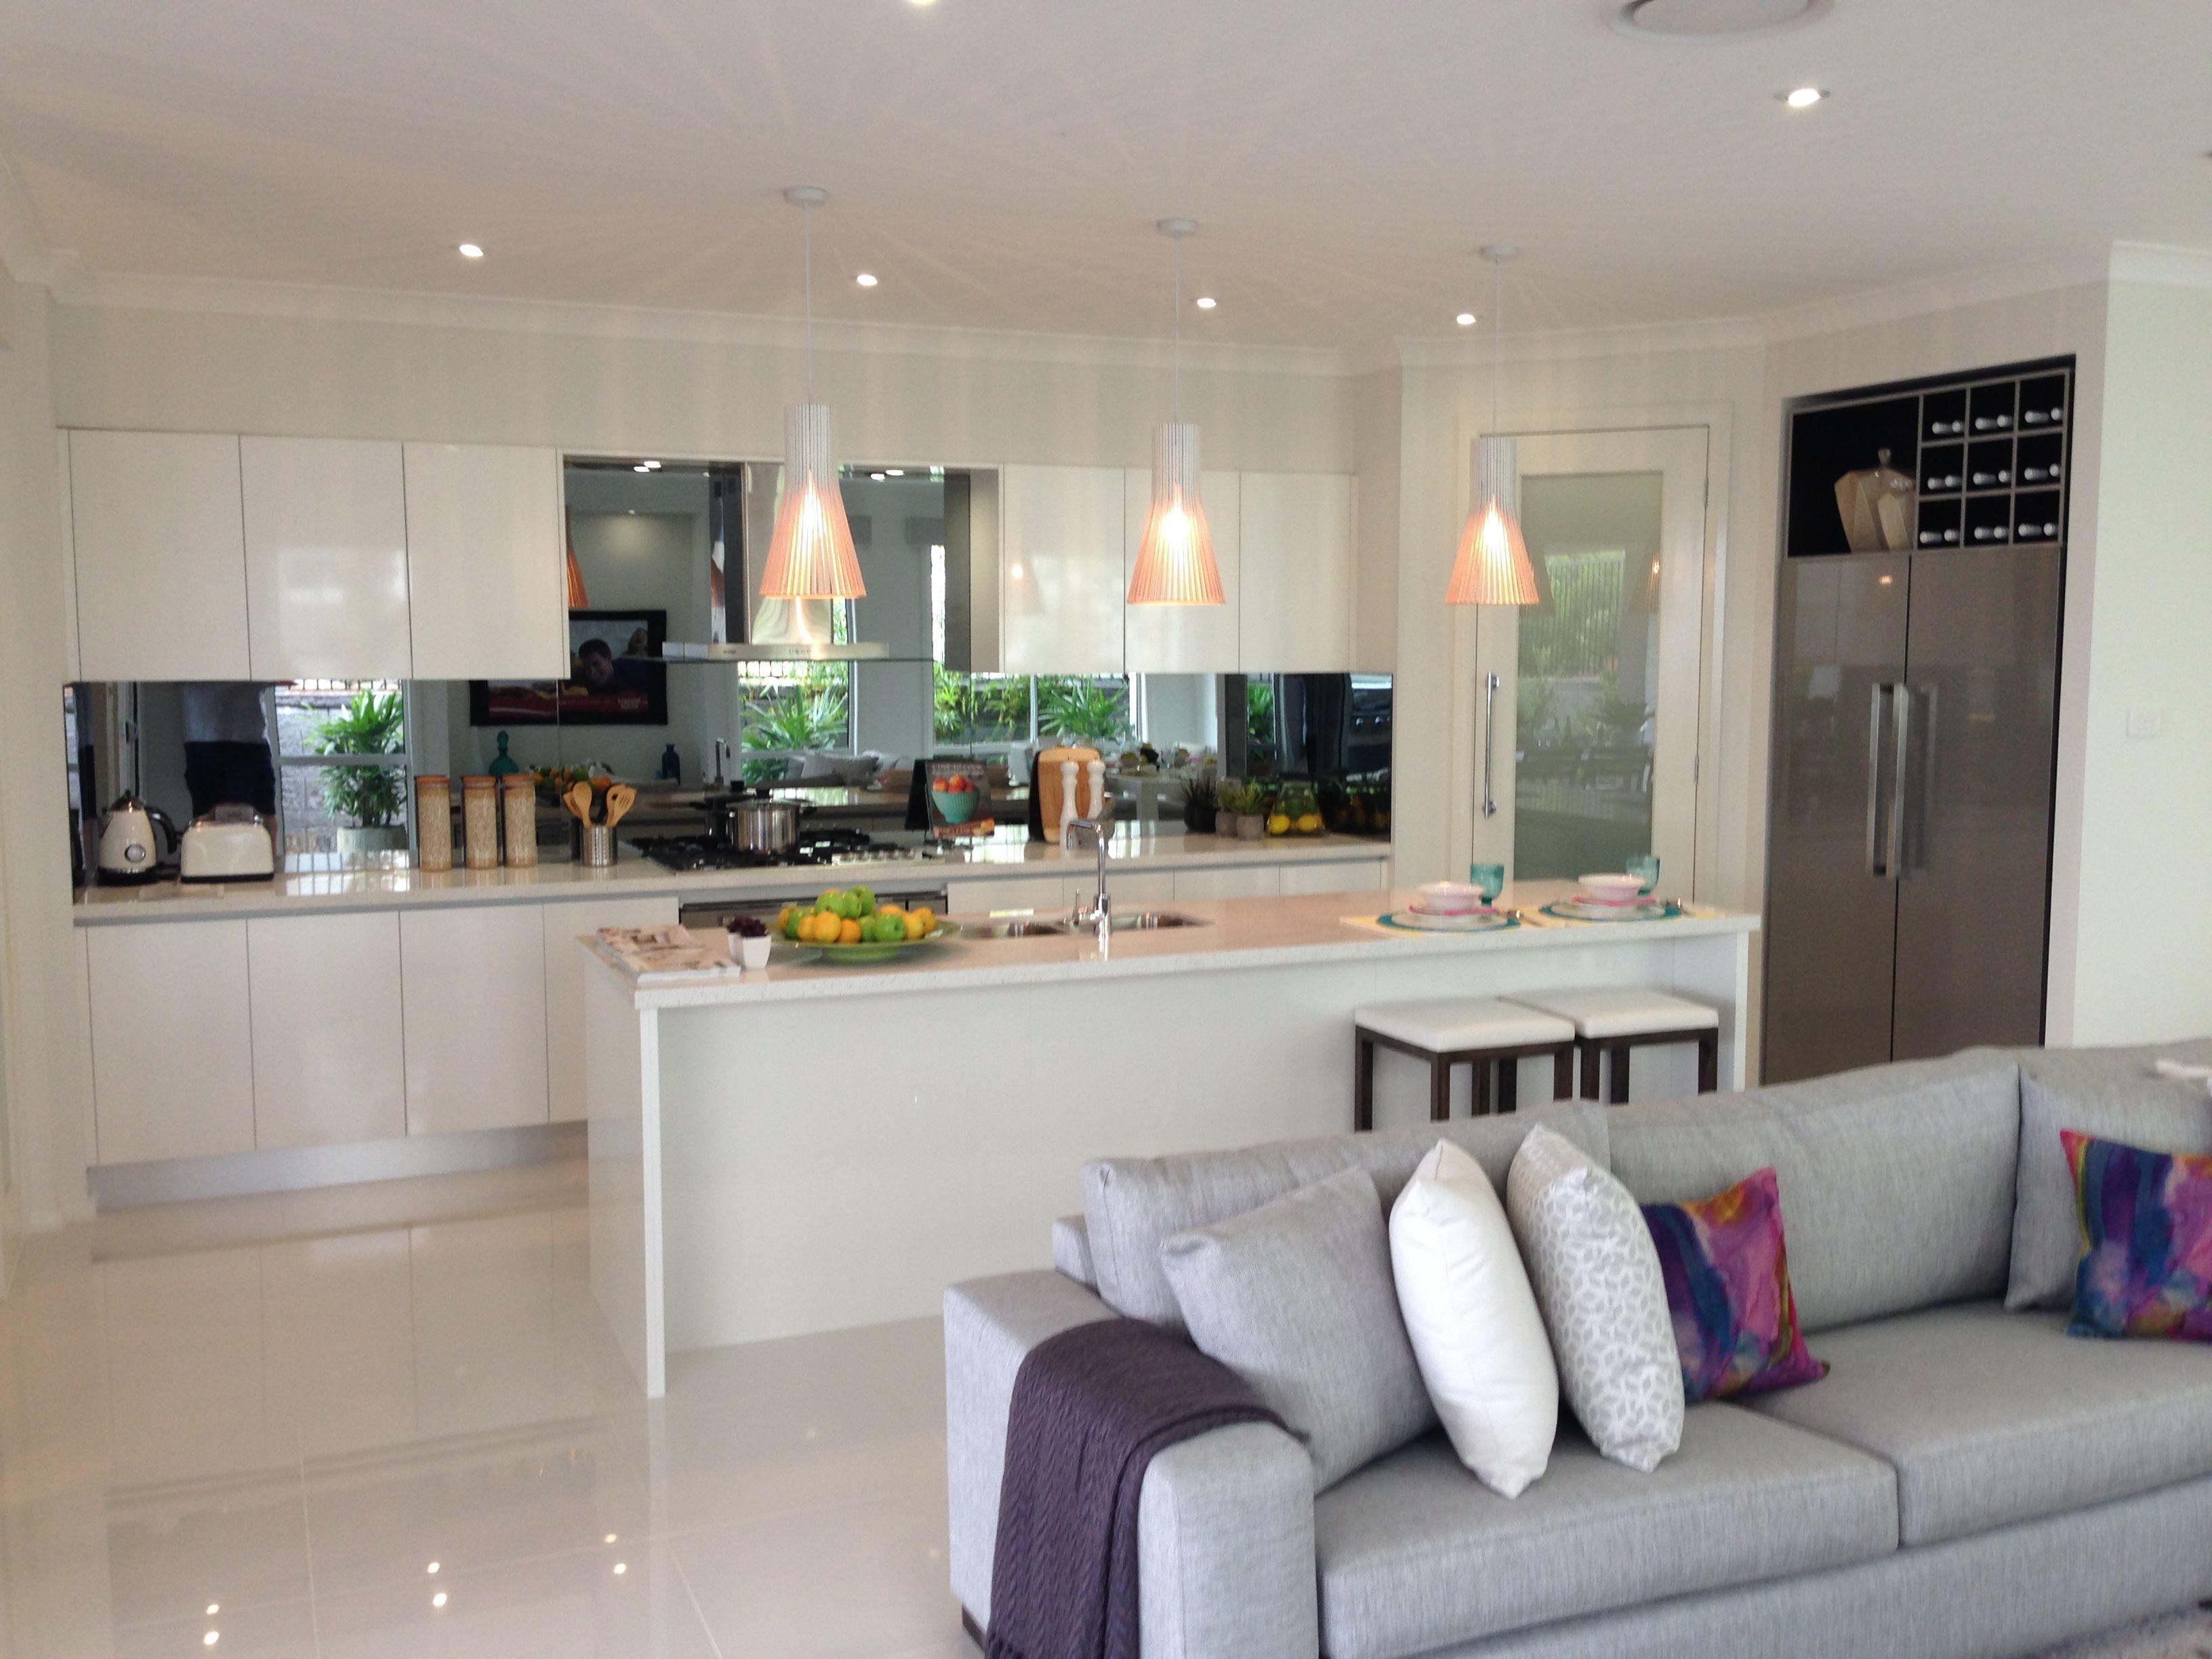 Mcdonald jones havana executive ideas for the house for Mcdonald jones kitchen designs